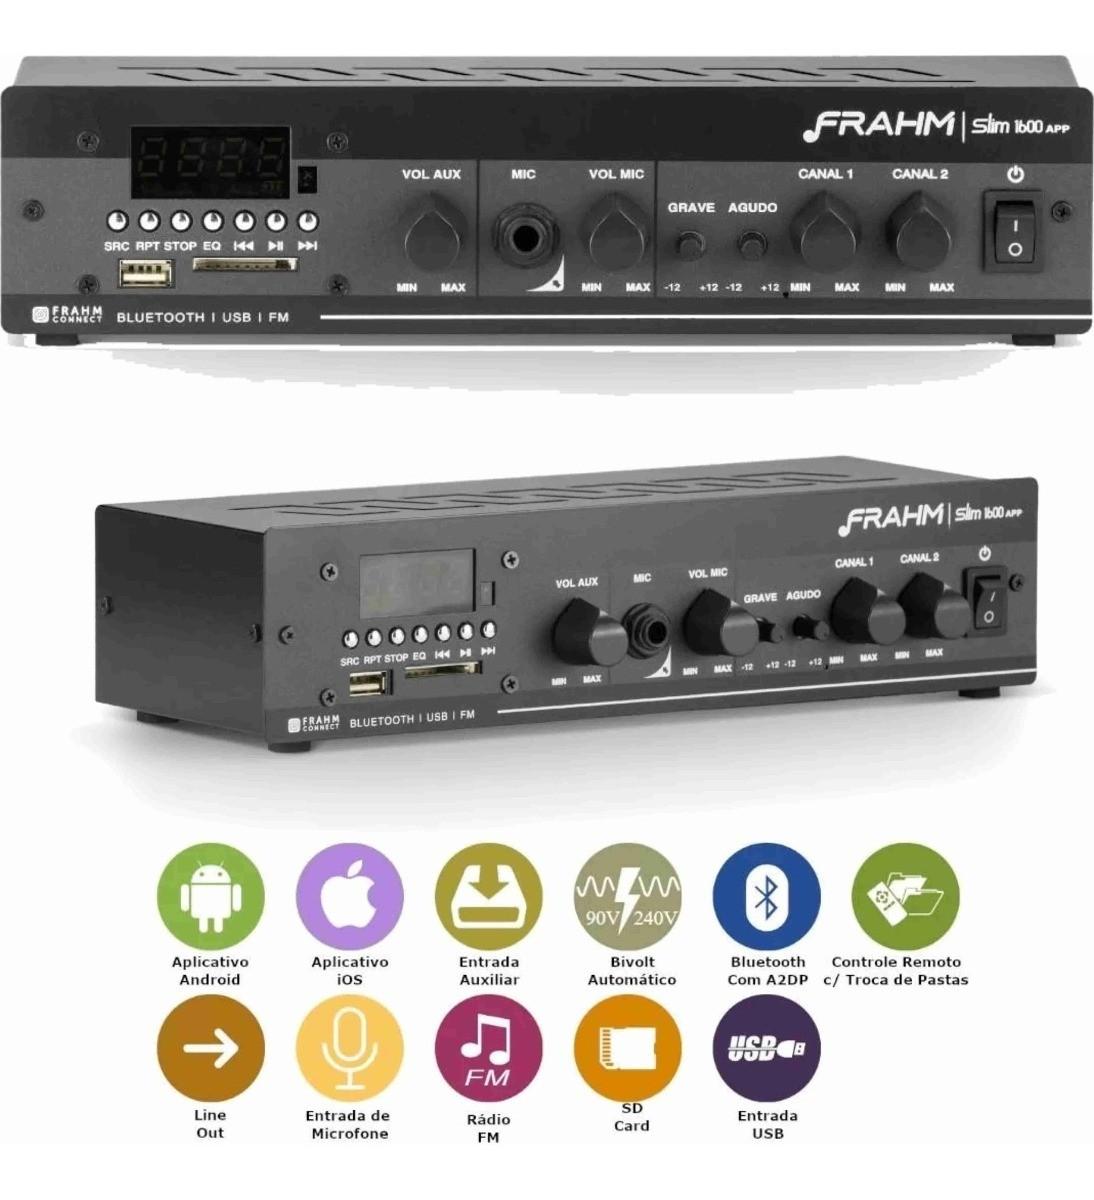 Amplificador Receiver Frahm Slim 1600 App Multi Channel